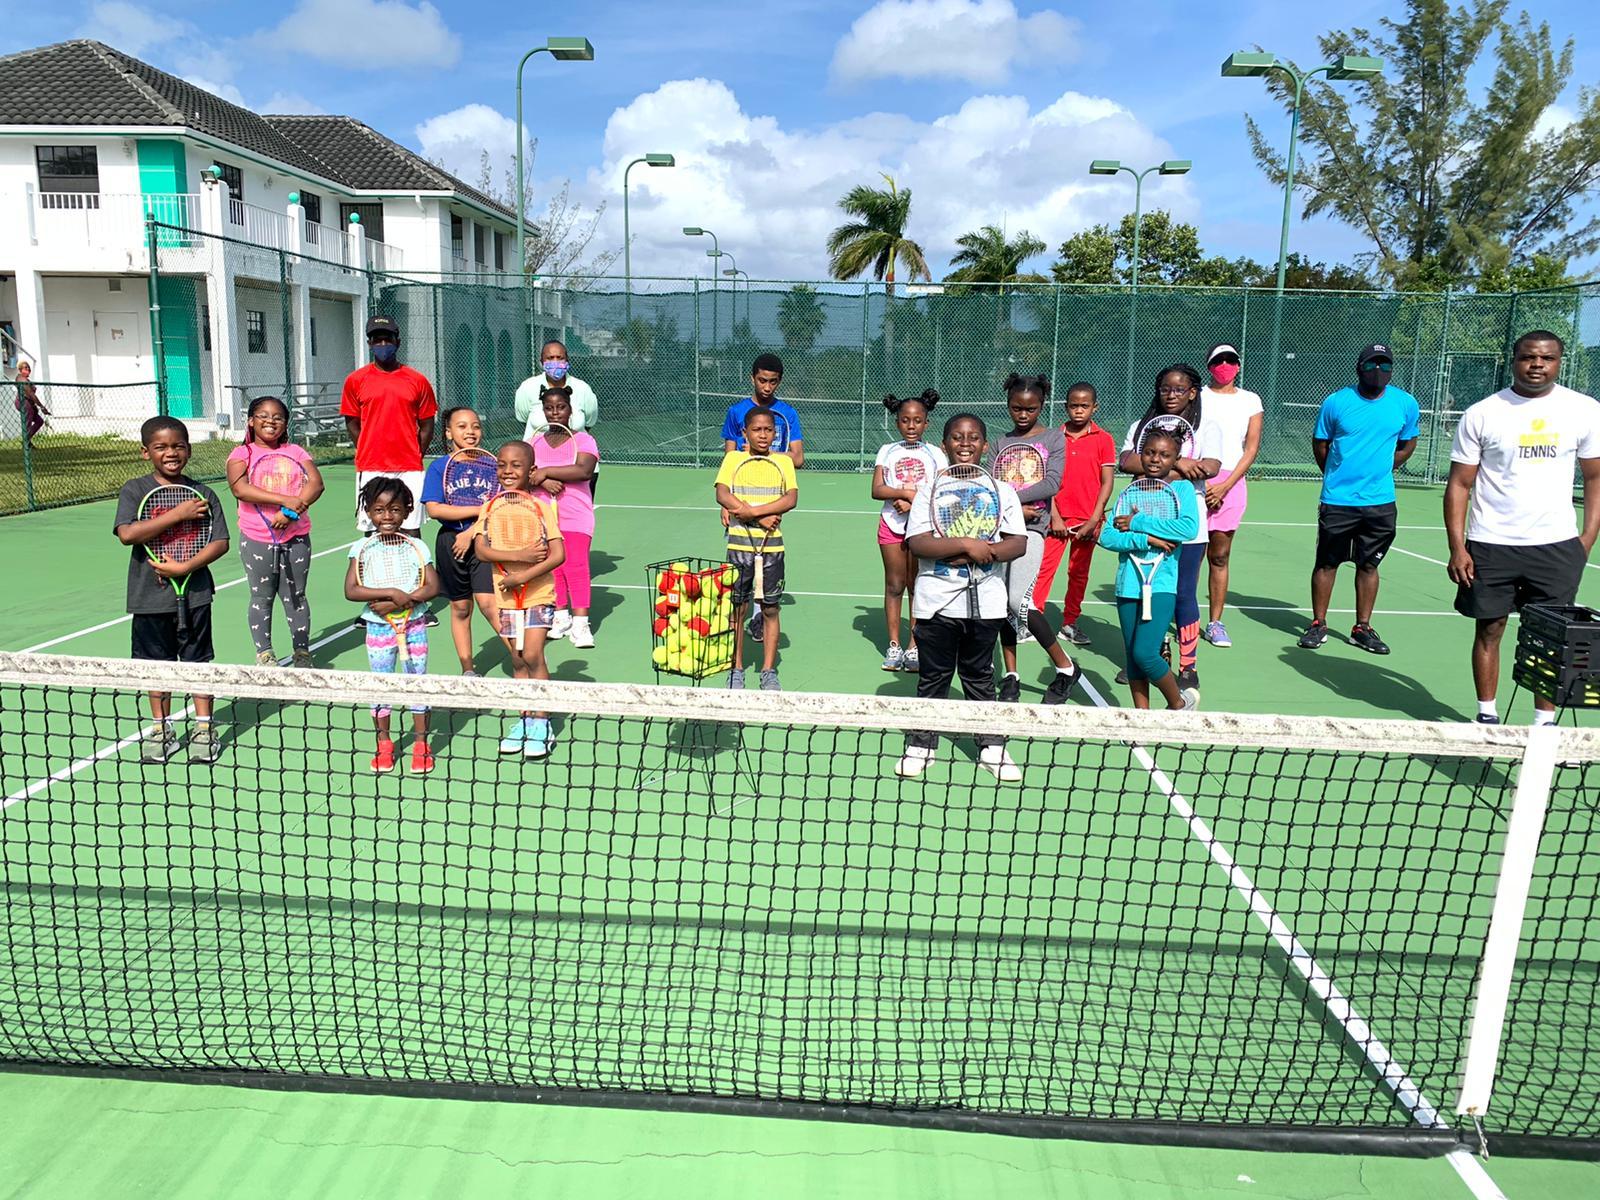 BLTA Play Tennis youth program resumes